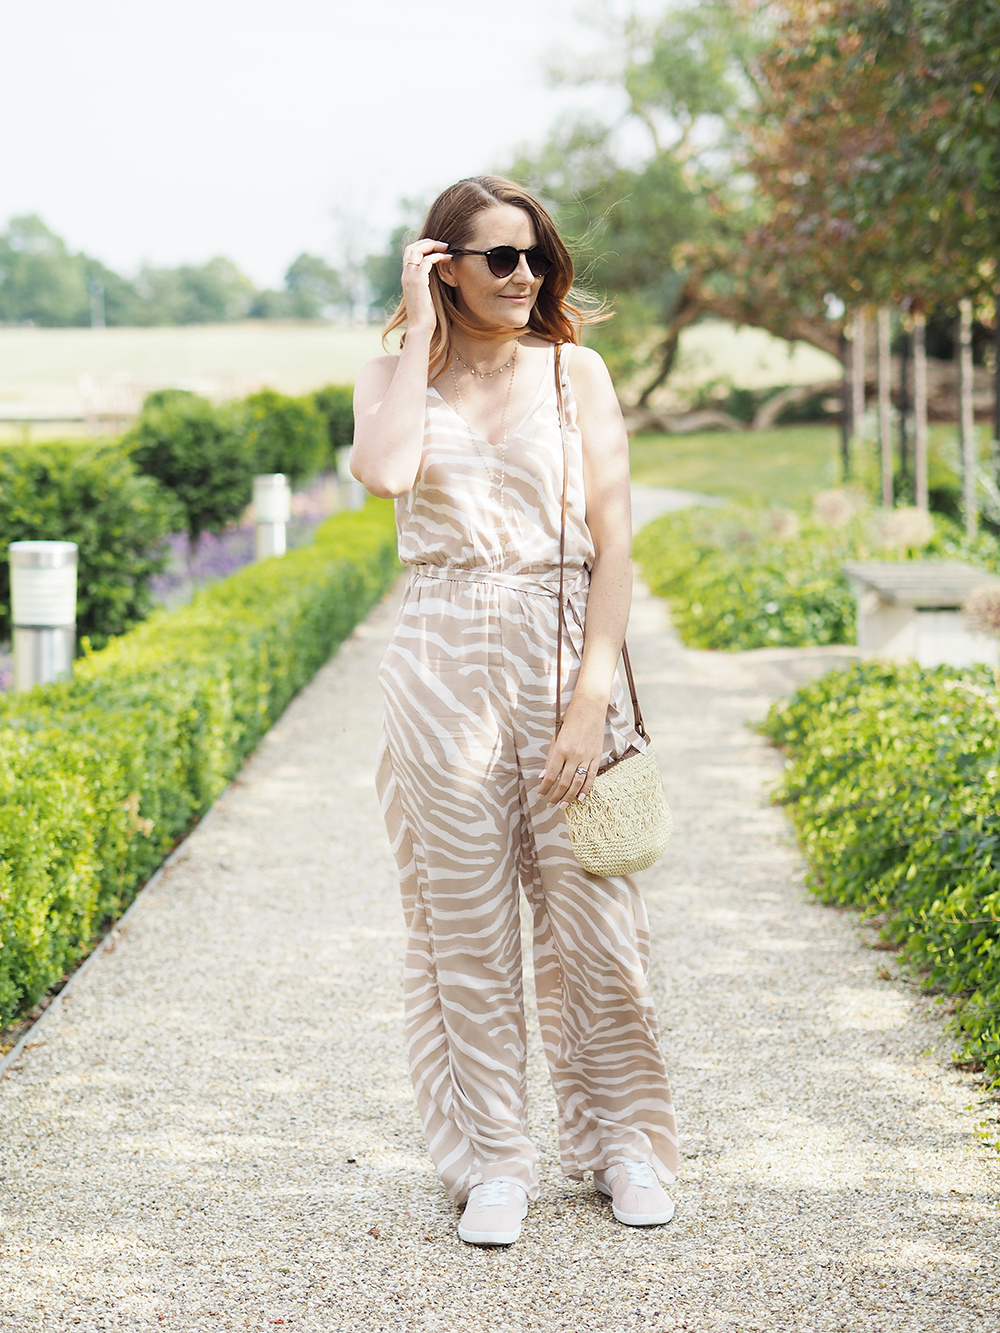 Summer jumpsuit outfit